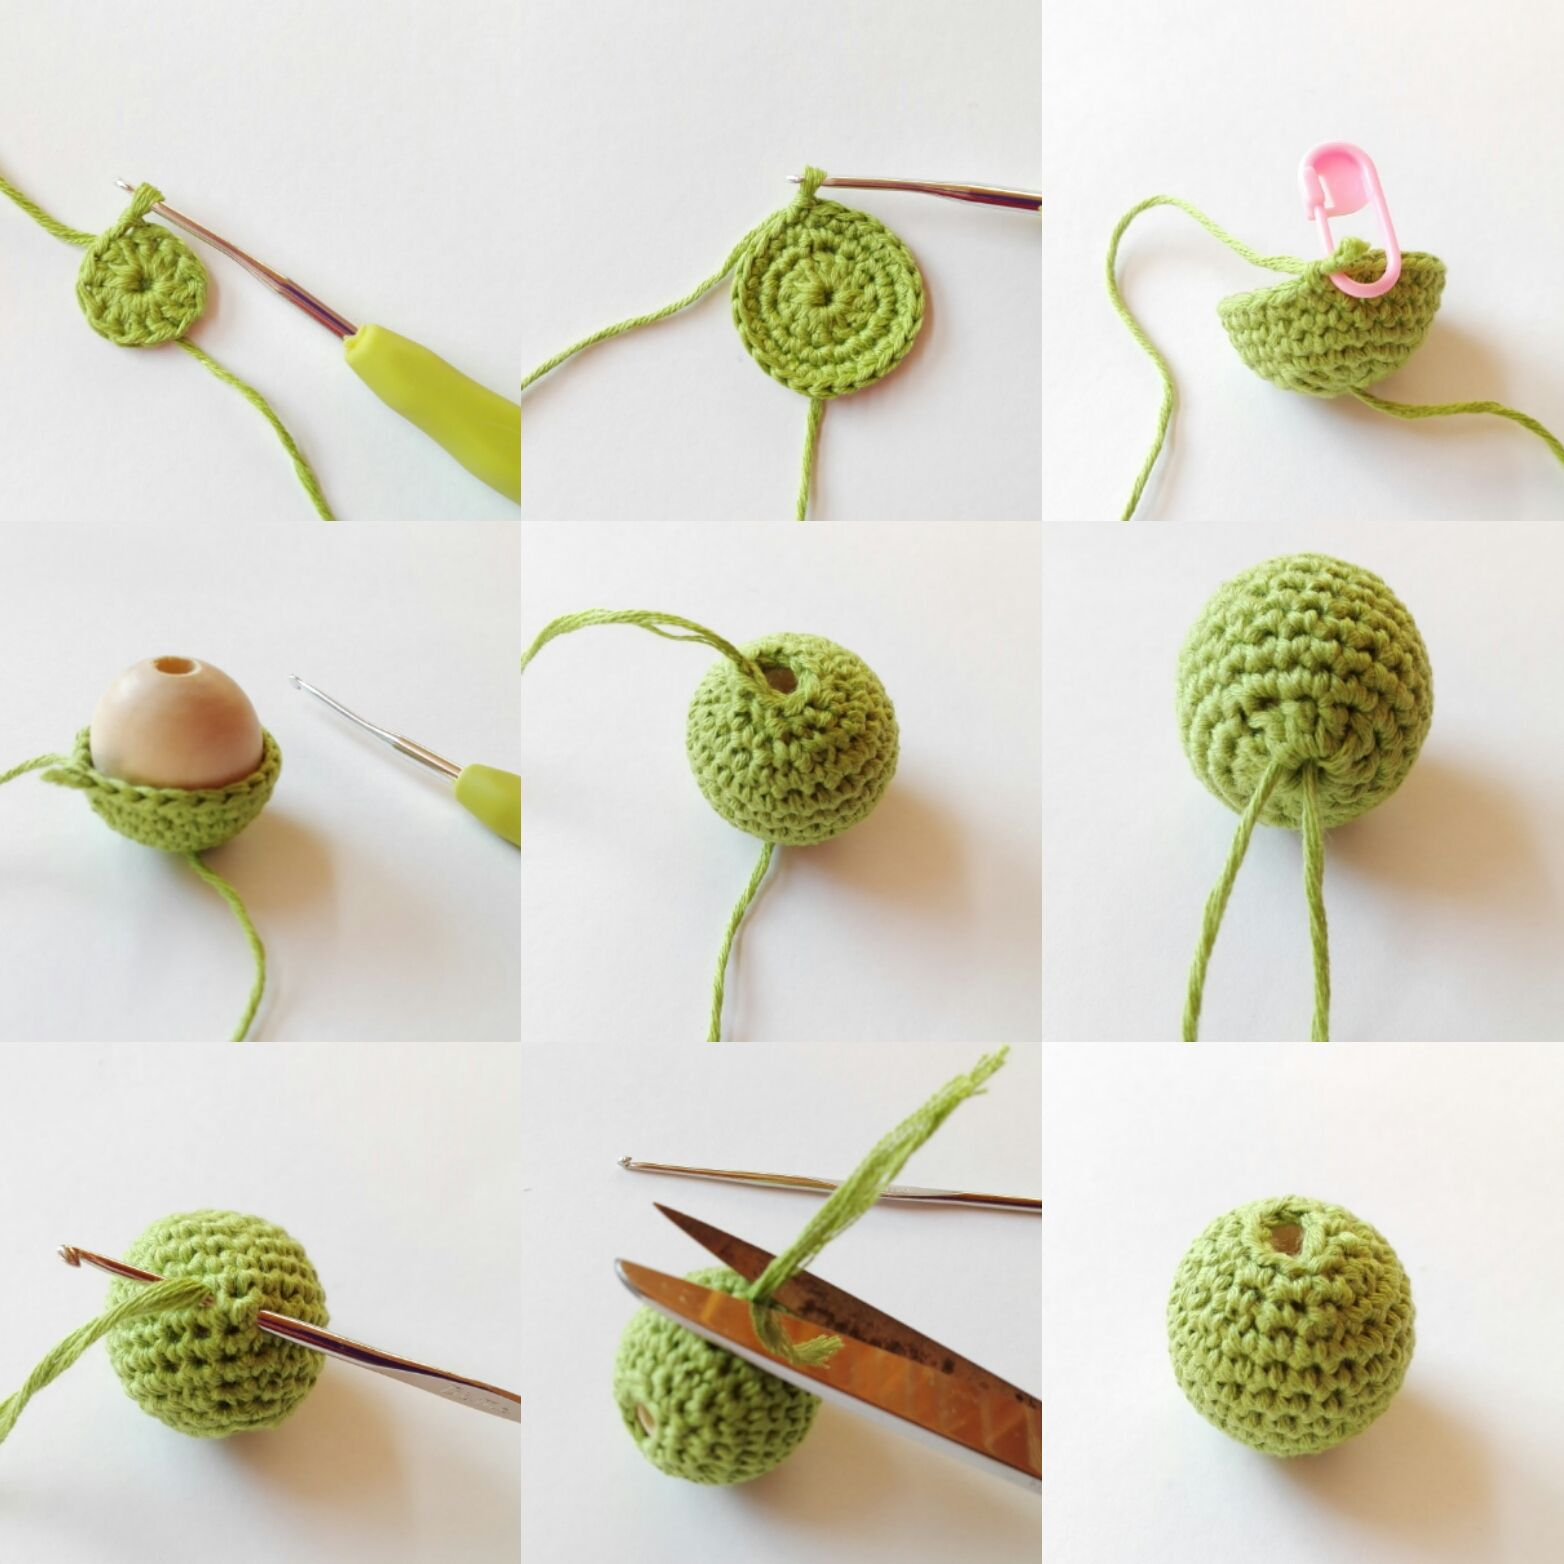 proceso de elaboración de las bolas de madera forradas a ganchillo ...